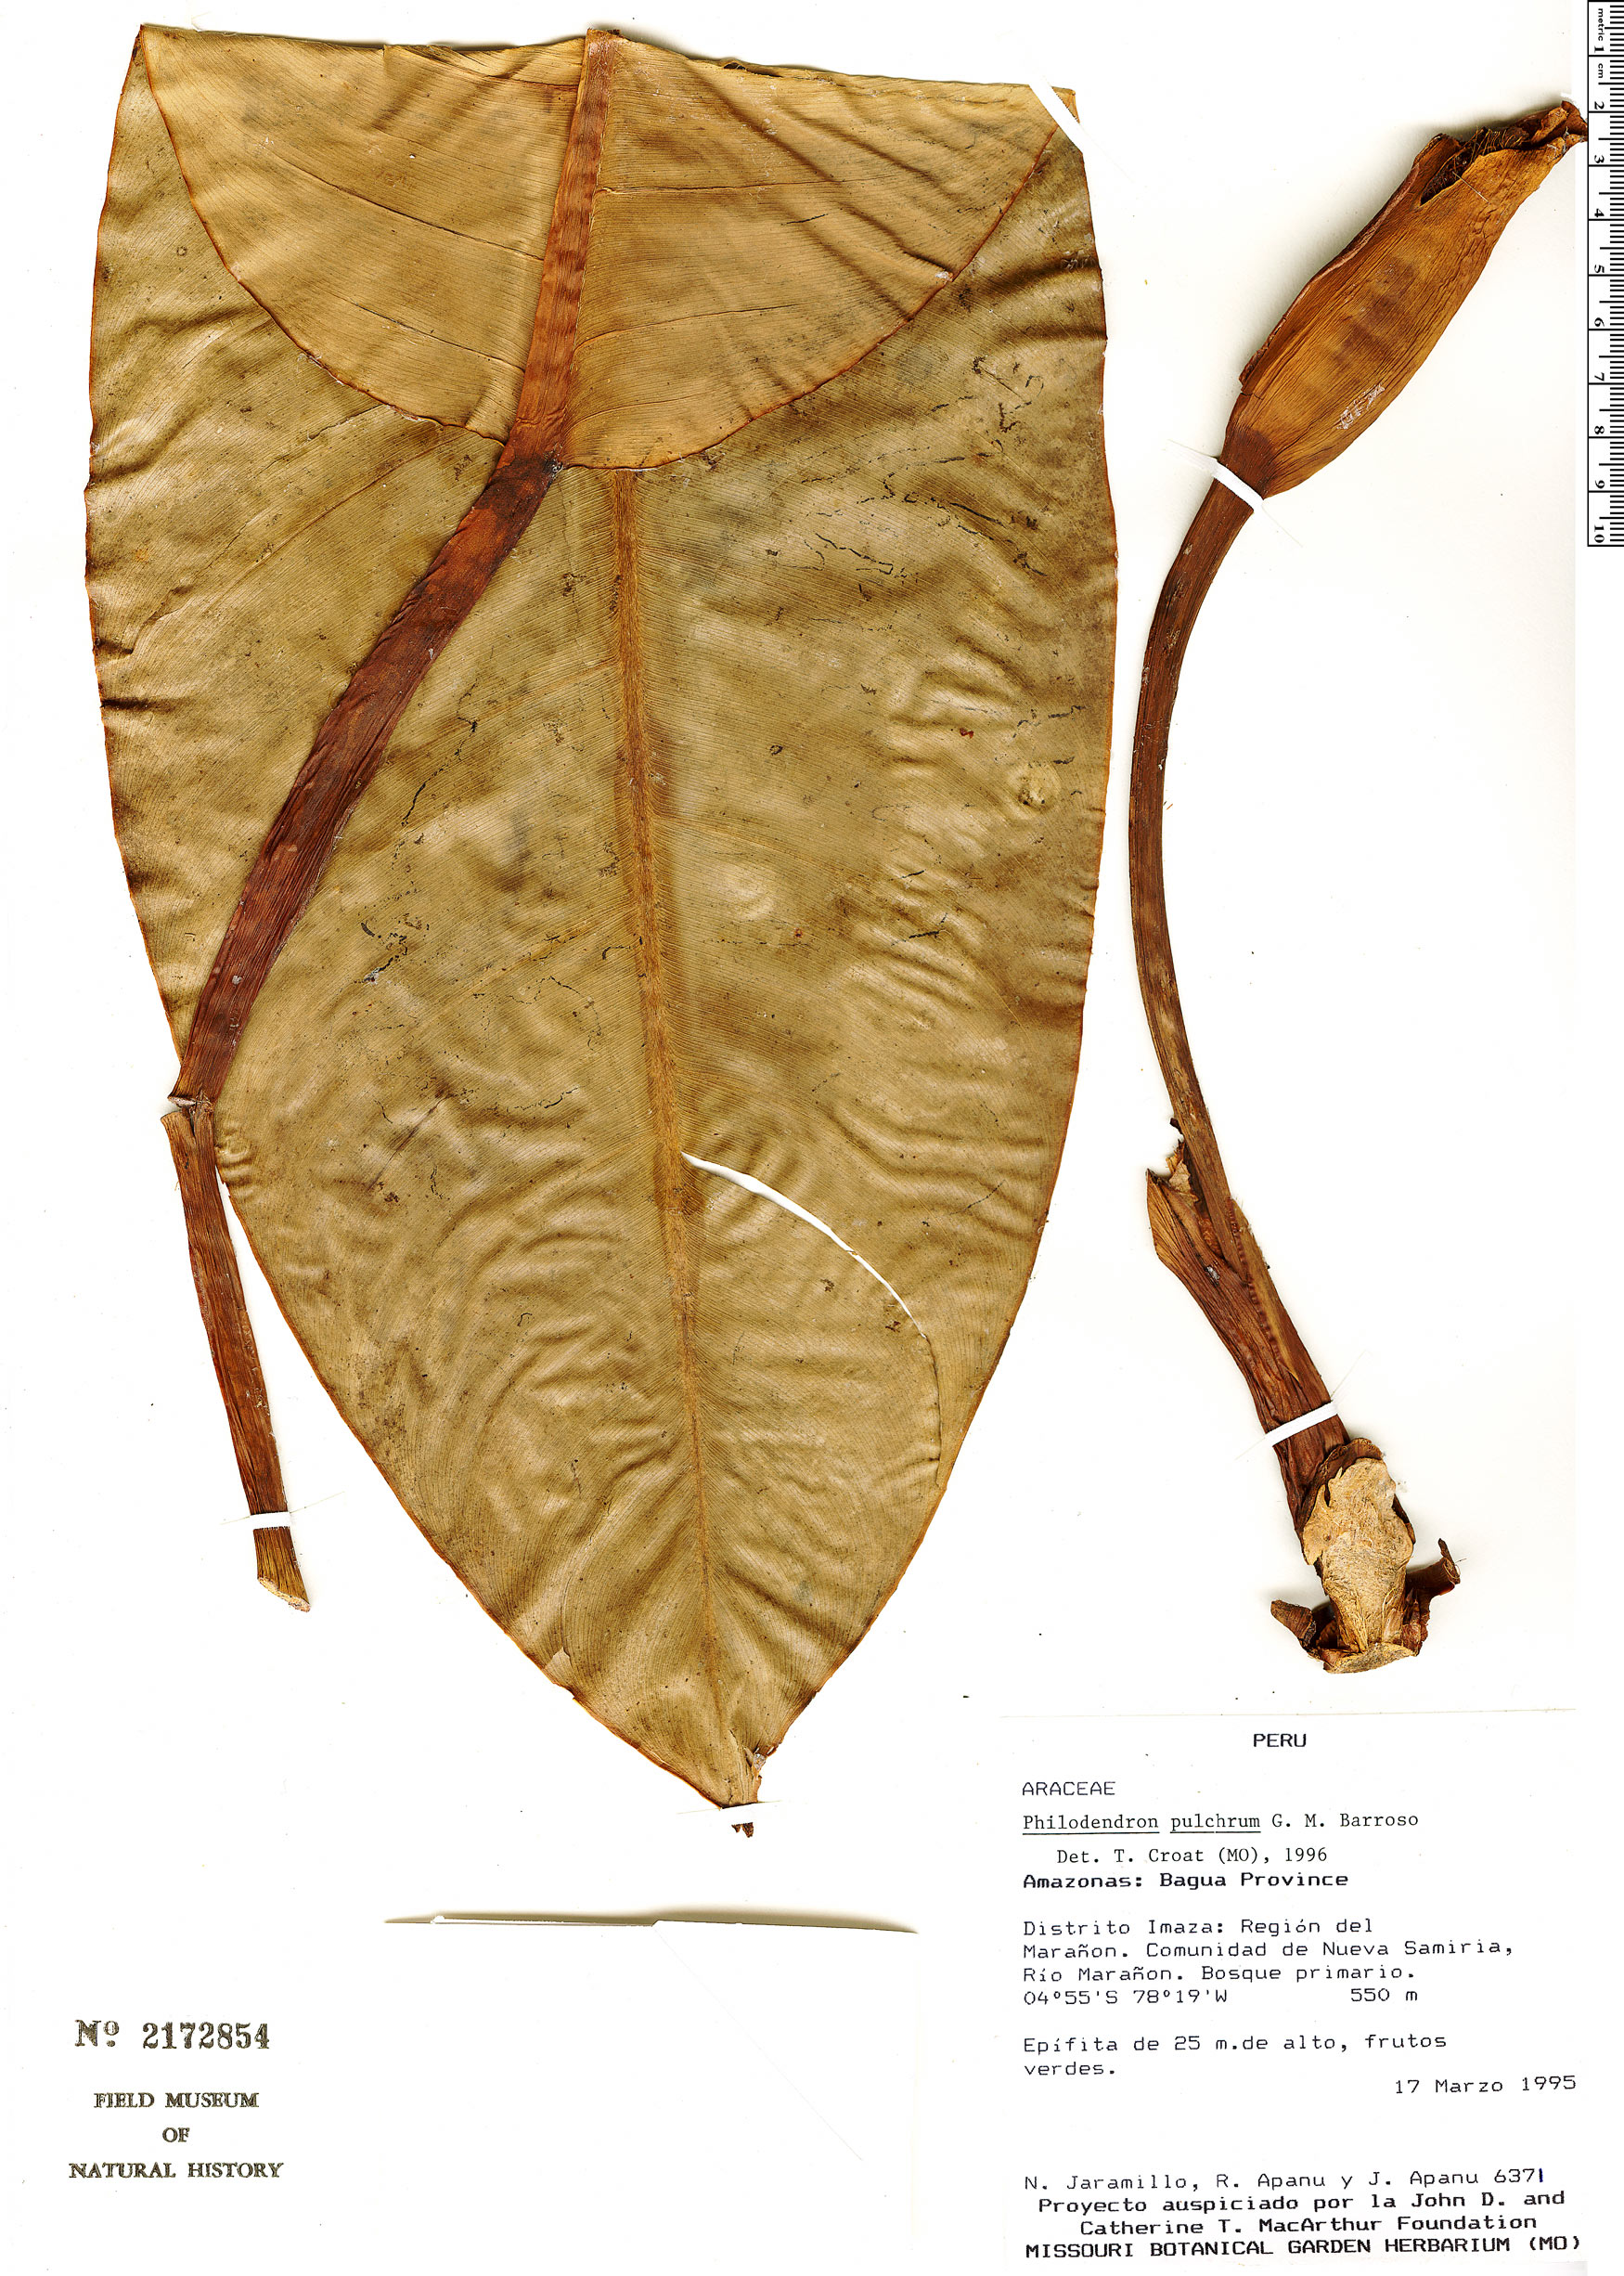 Specimen: Philodendron pulchrum